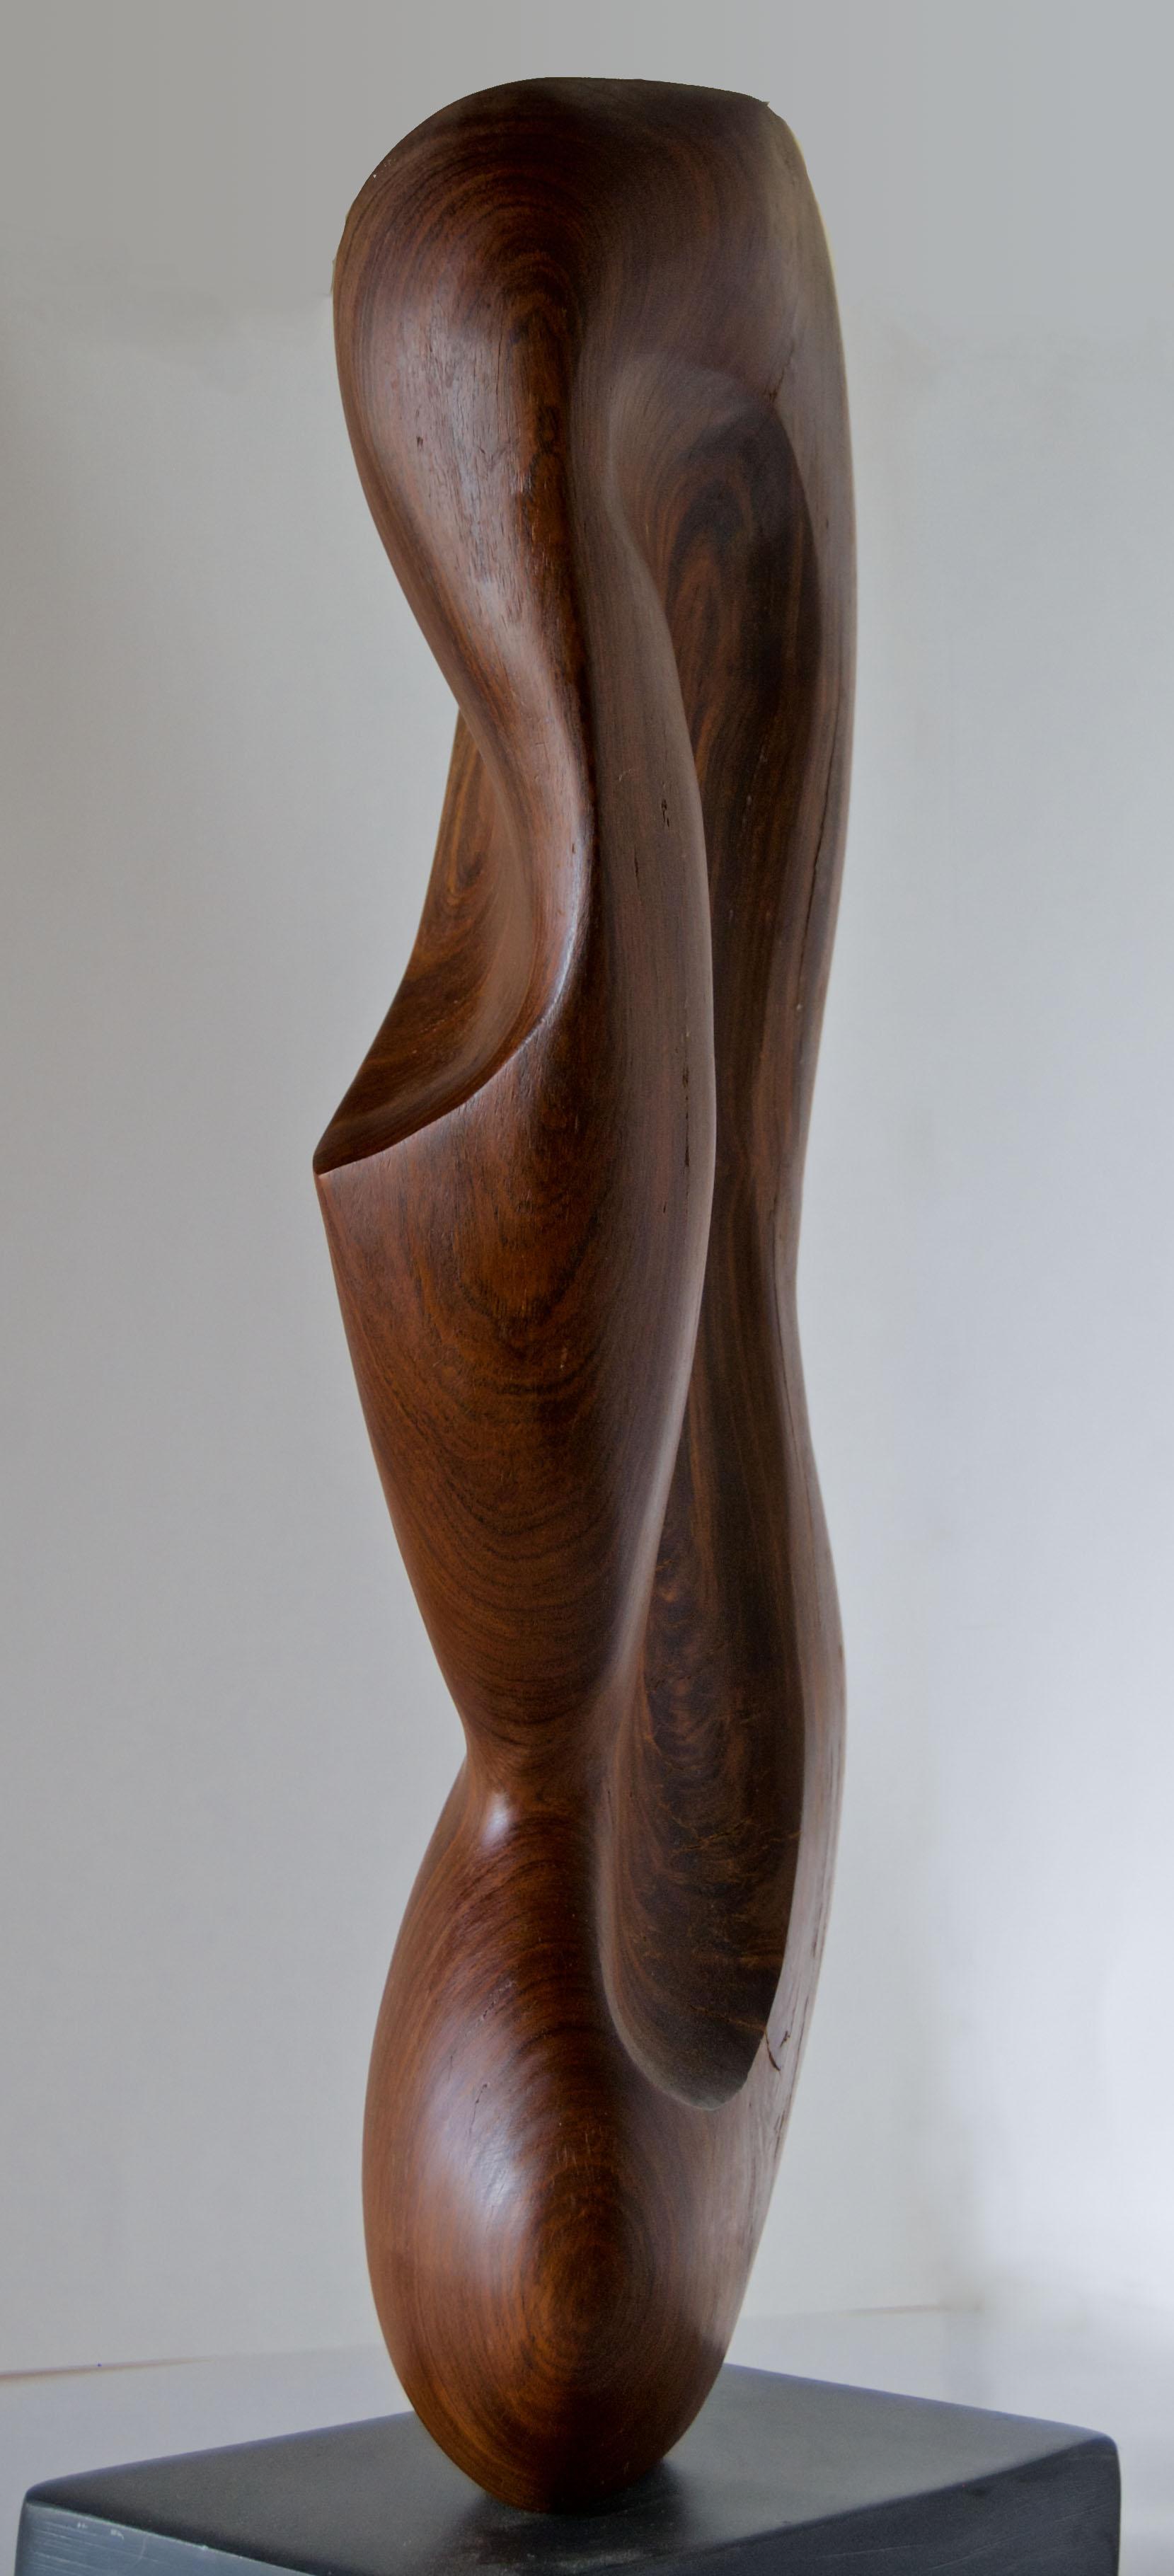 Wooden Sculpture Backside2.jpg